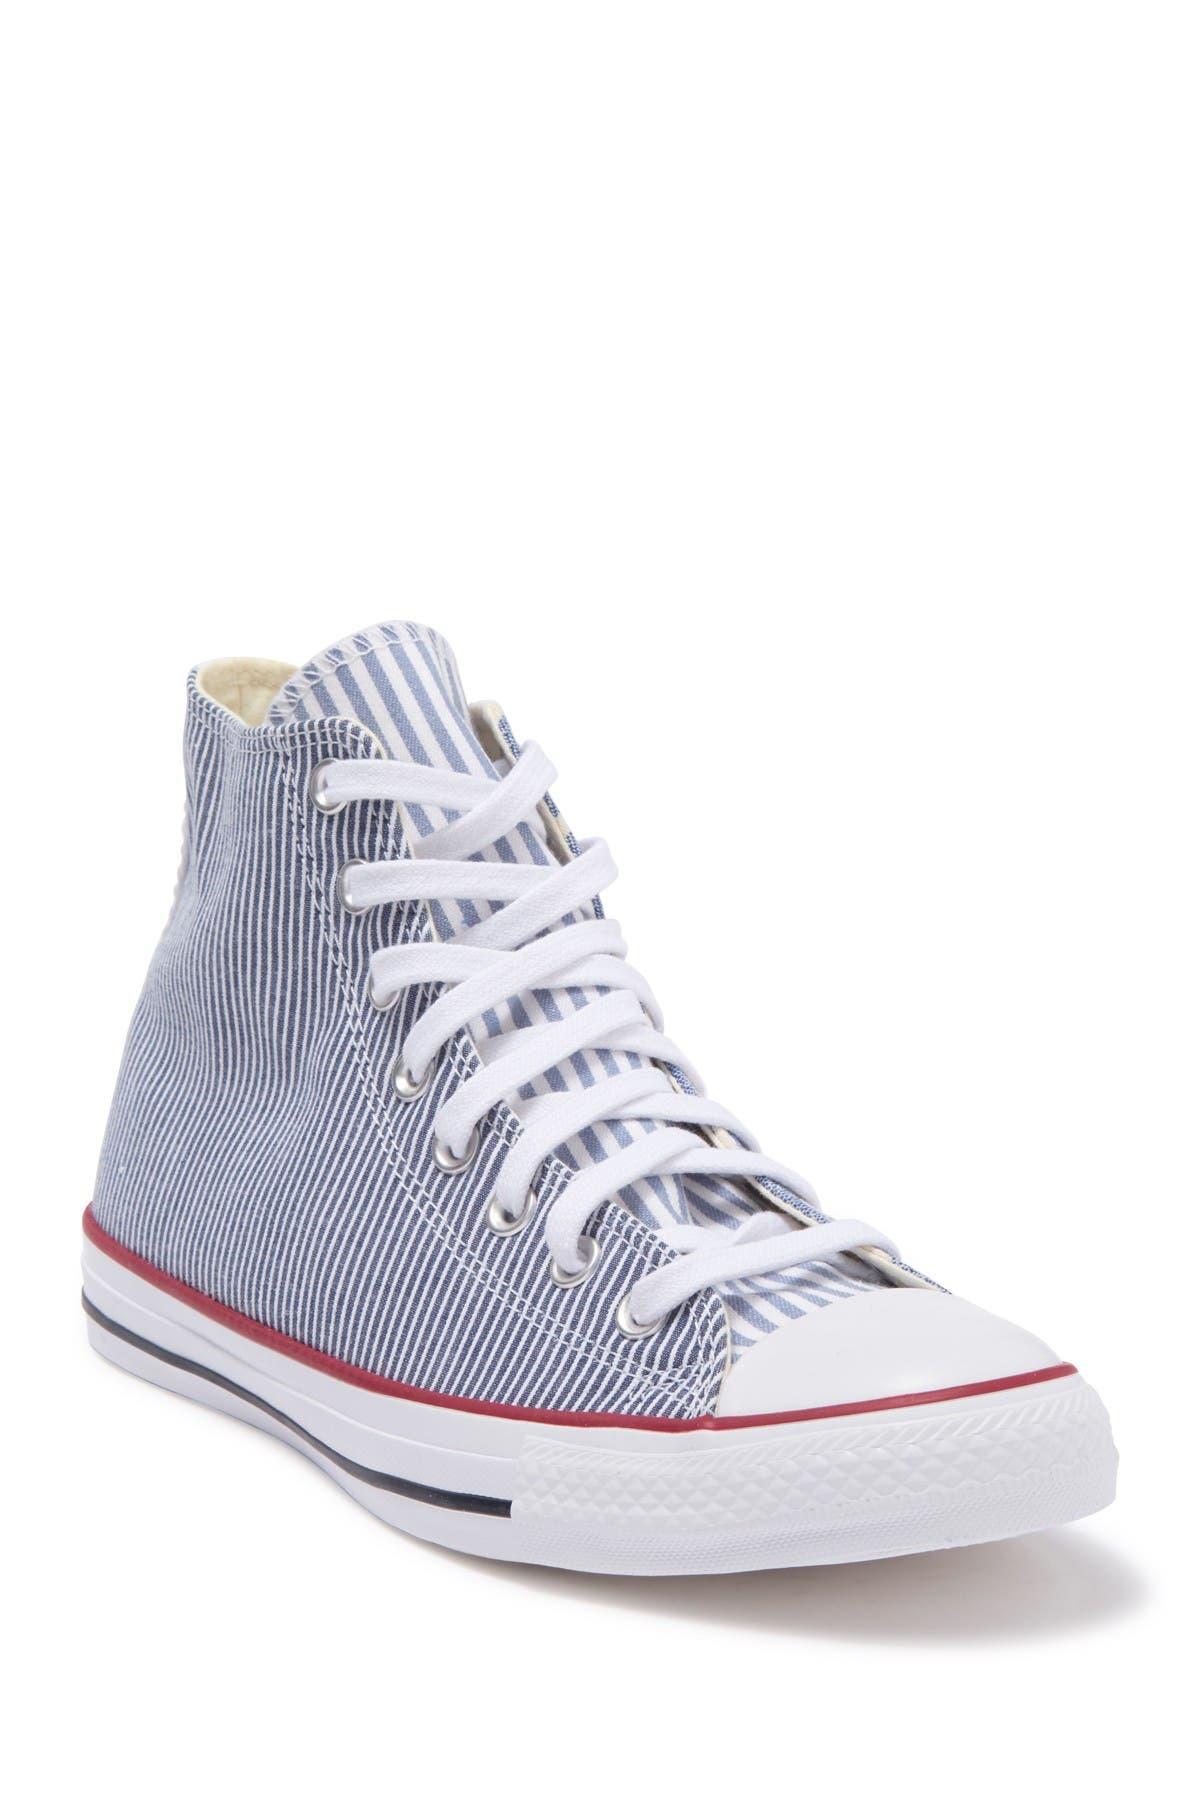 Image of Converse Chuck Taylor All Star Hi Top Sneaker